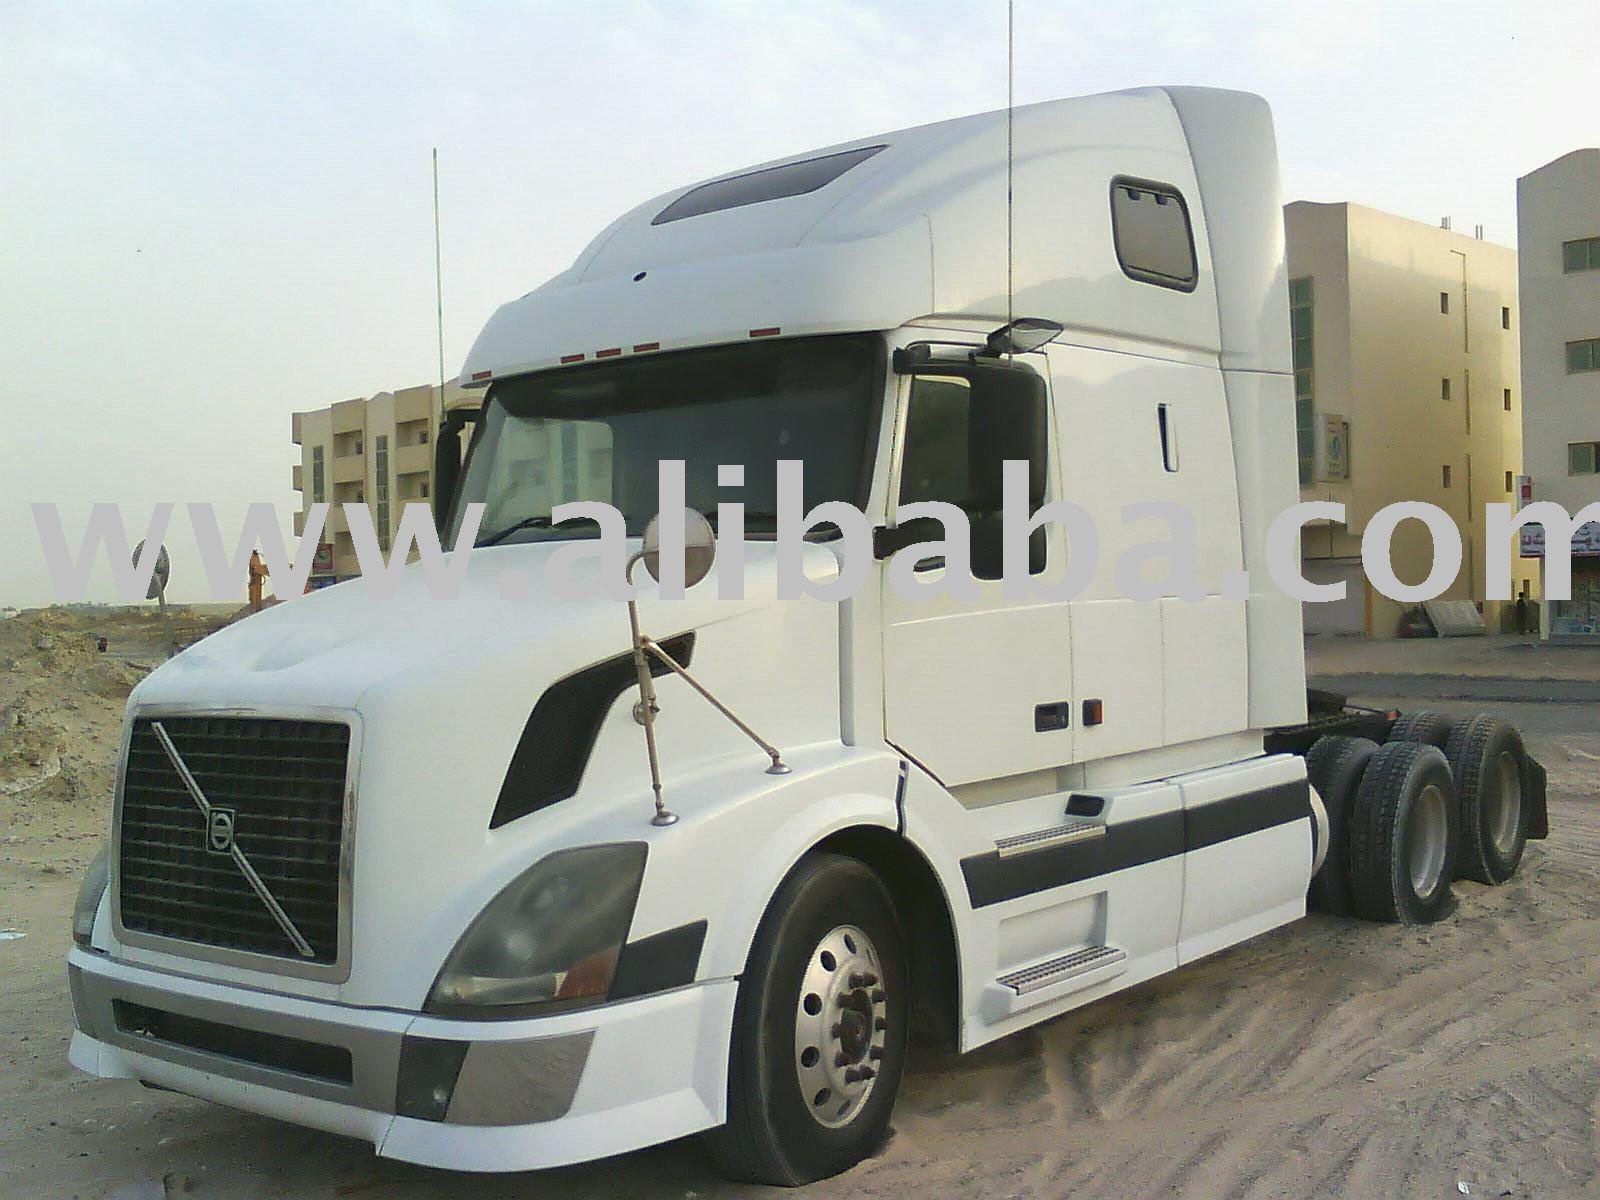 volvo youtube used semi sale peterbilt watch trucks call truck for